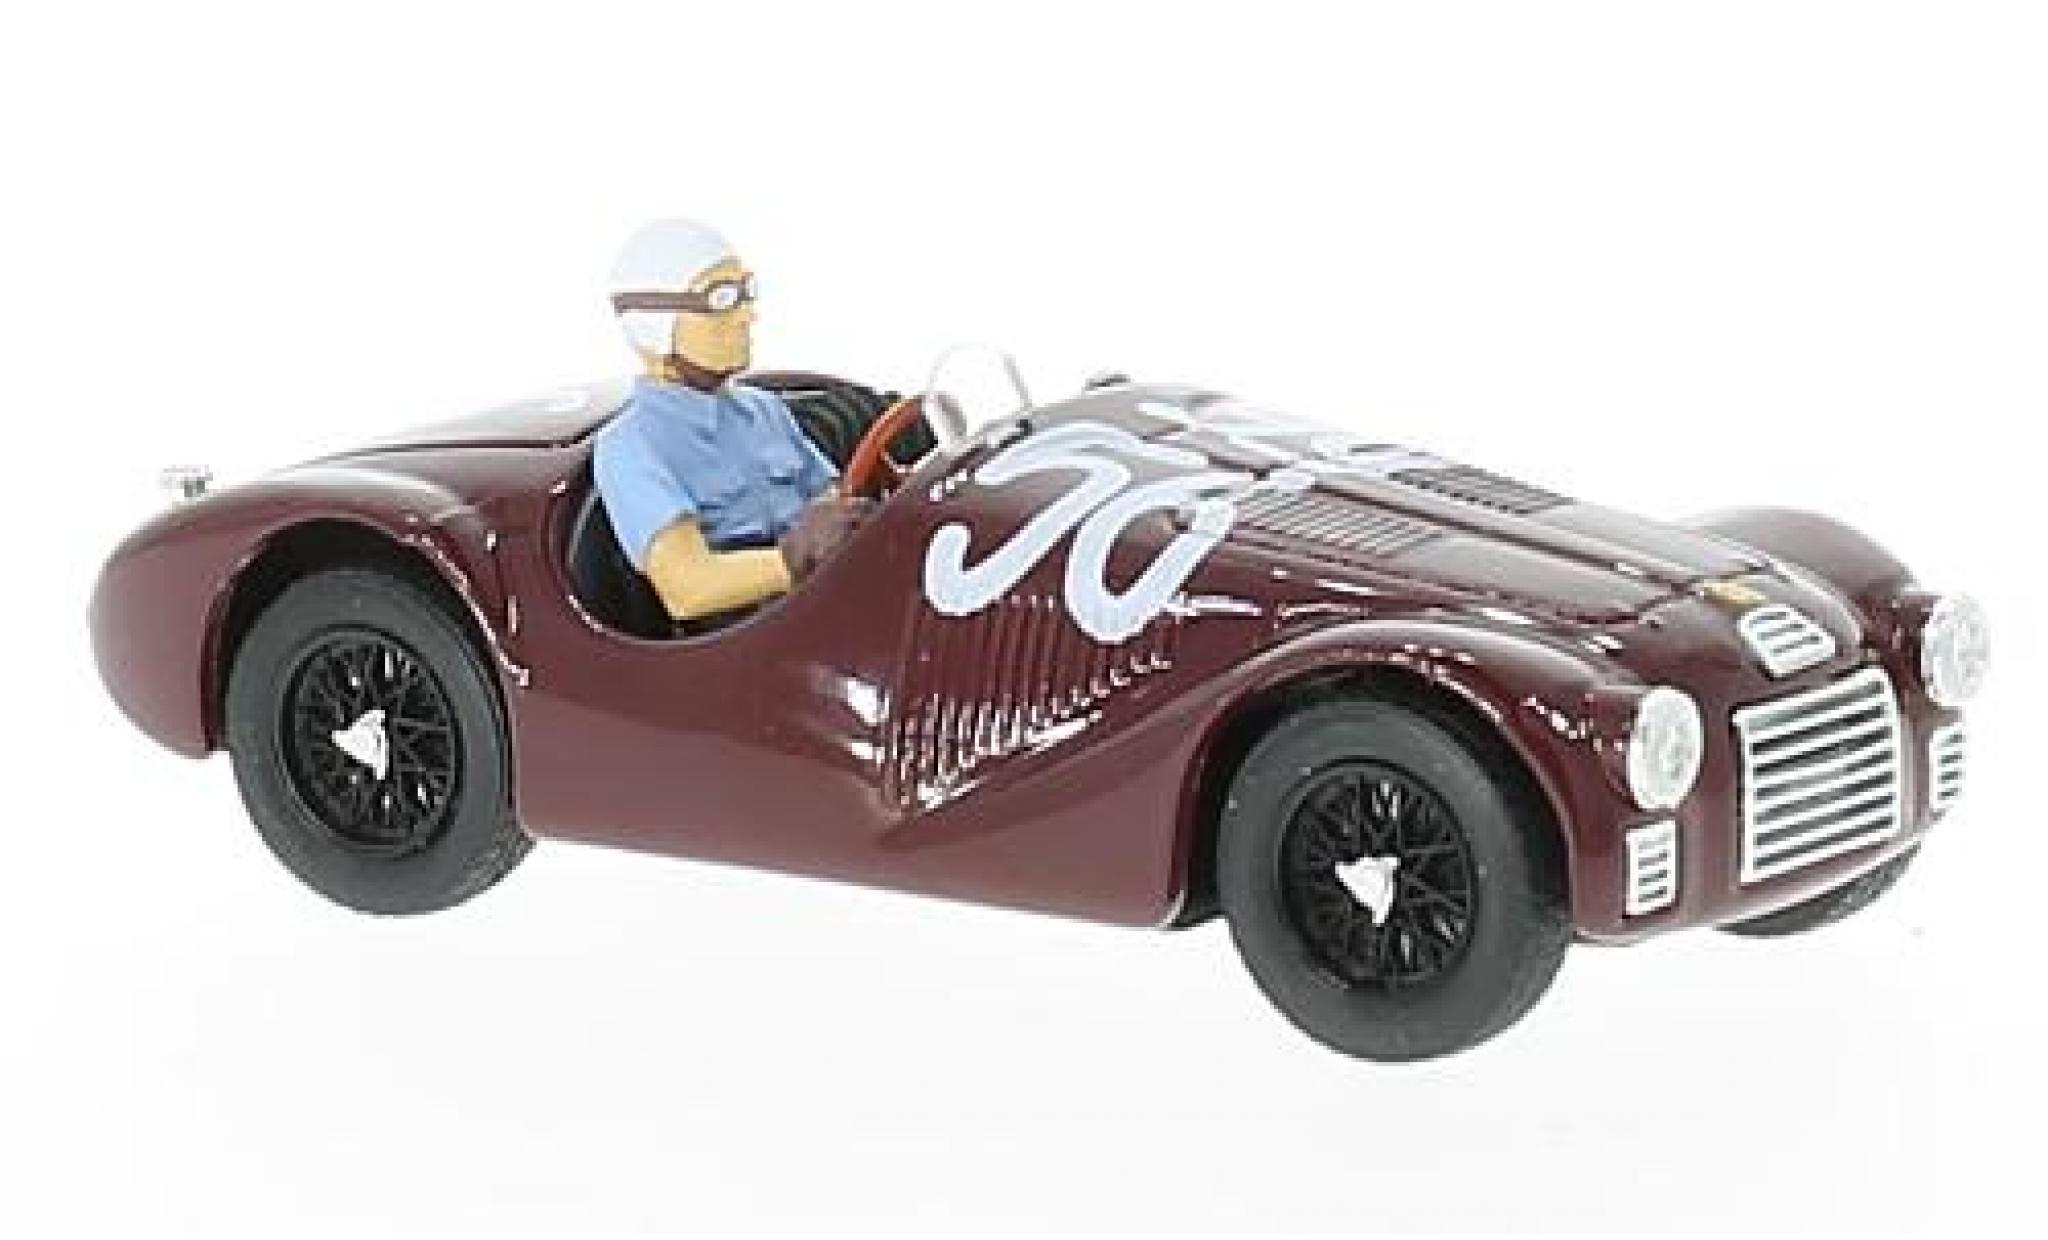 Ferrari 125 1/43 Brumm S RHD No.56 GP Rom 1947 La Vittoria Assoluta 70. Anniverary F.Cortese